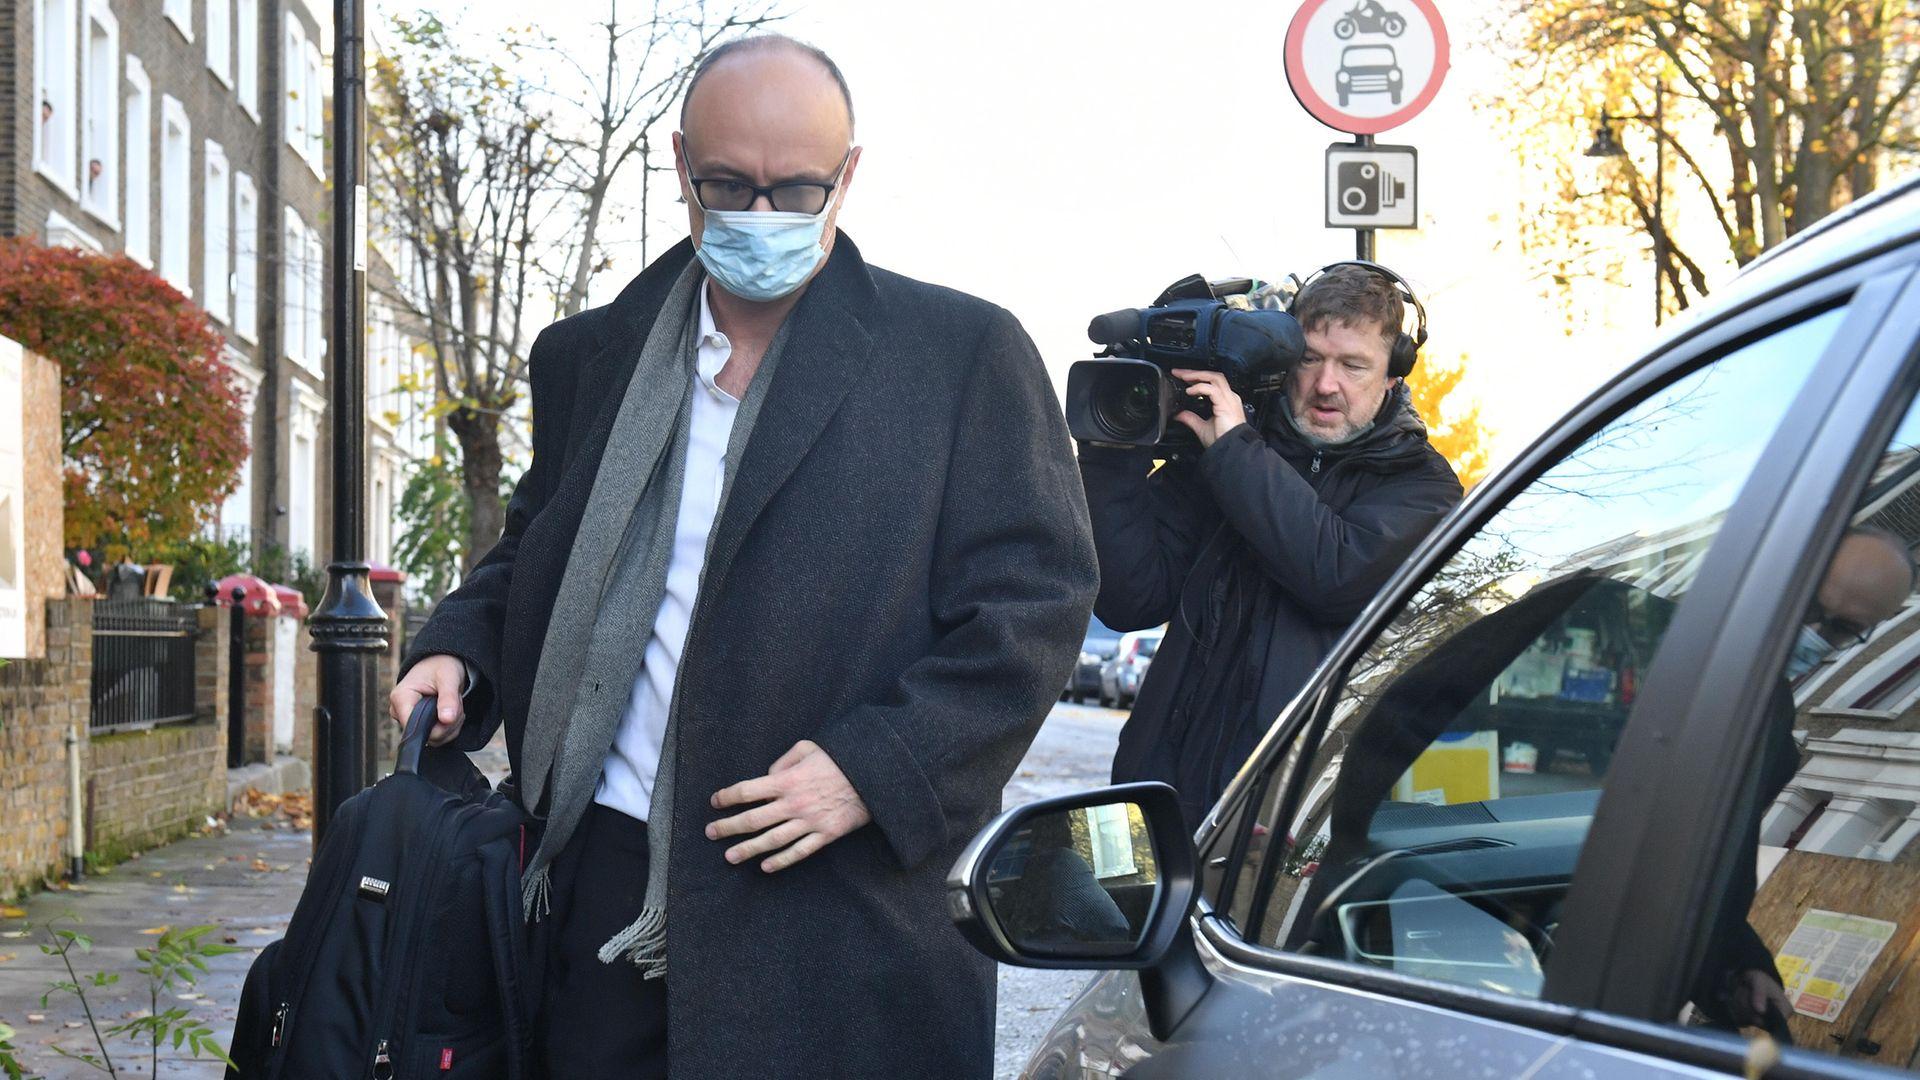 Prime minister Boris Johnson's top aide Dominic Cummings leaving his north London home - Credit: PA